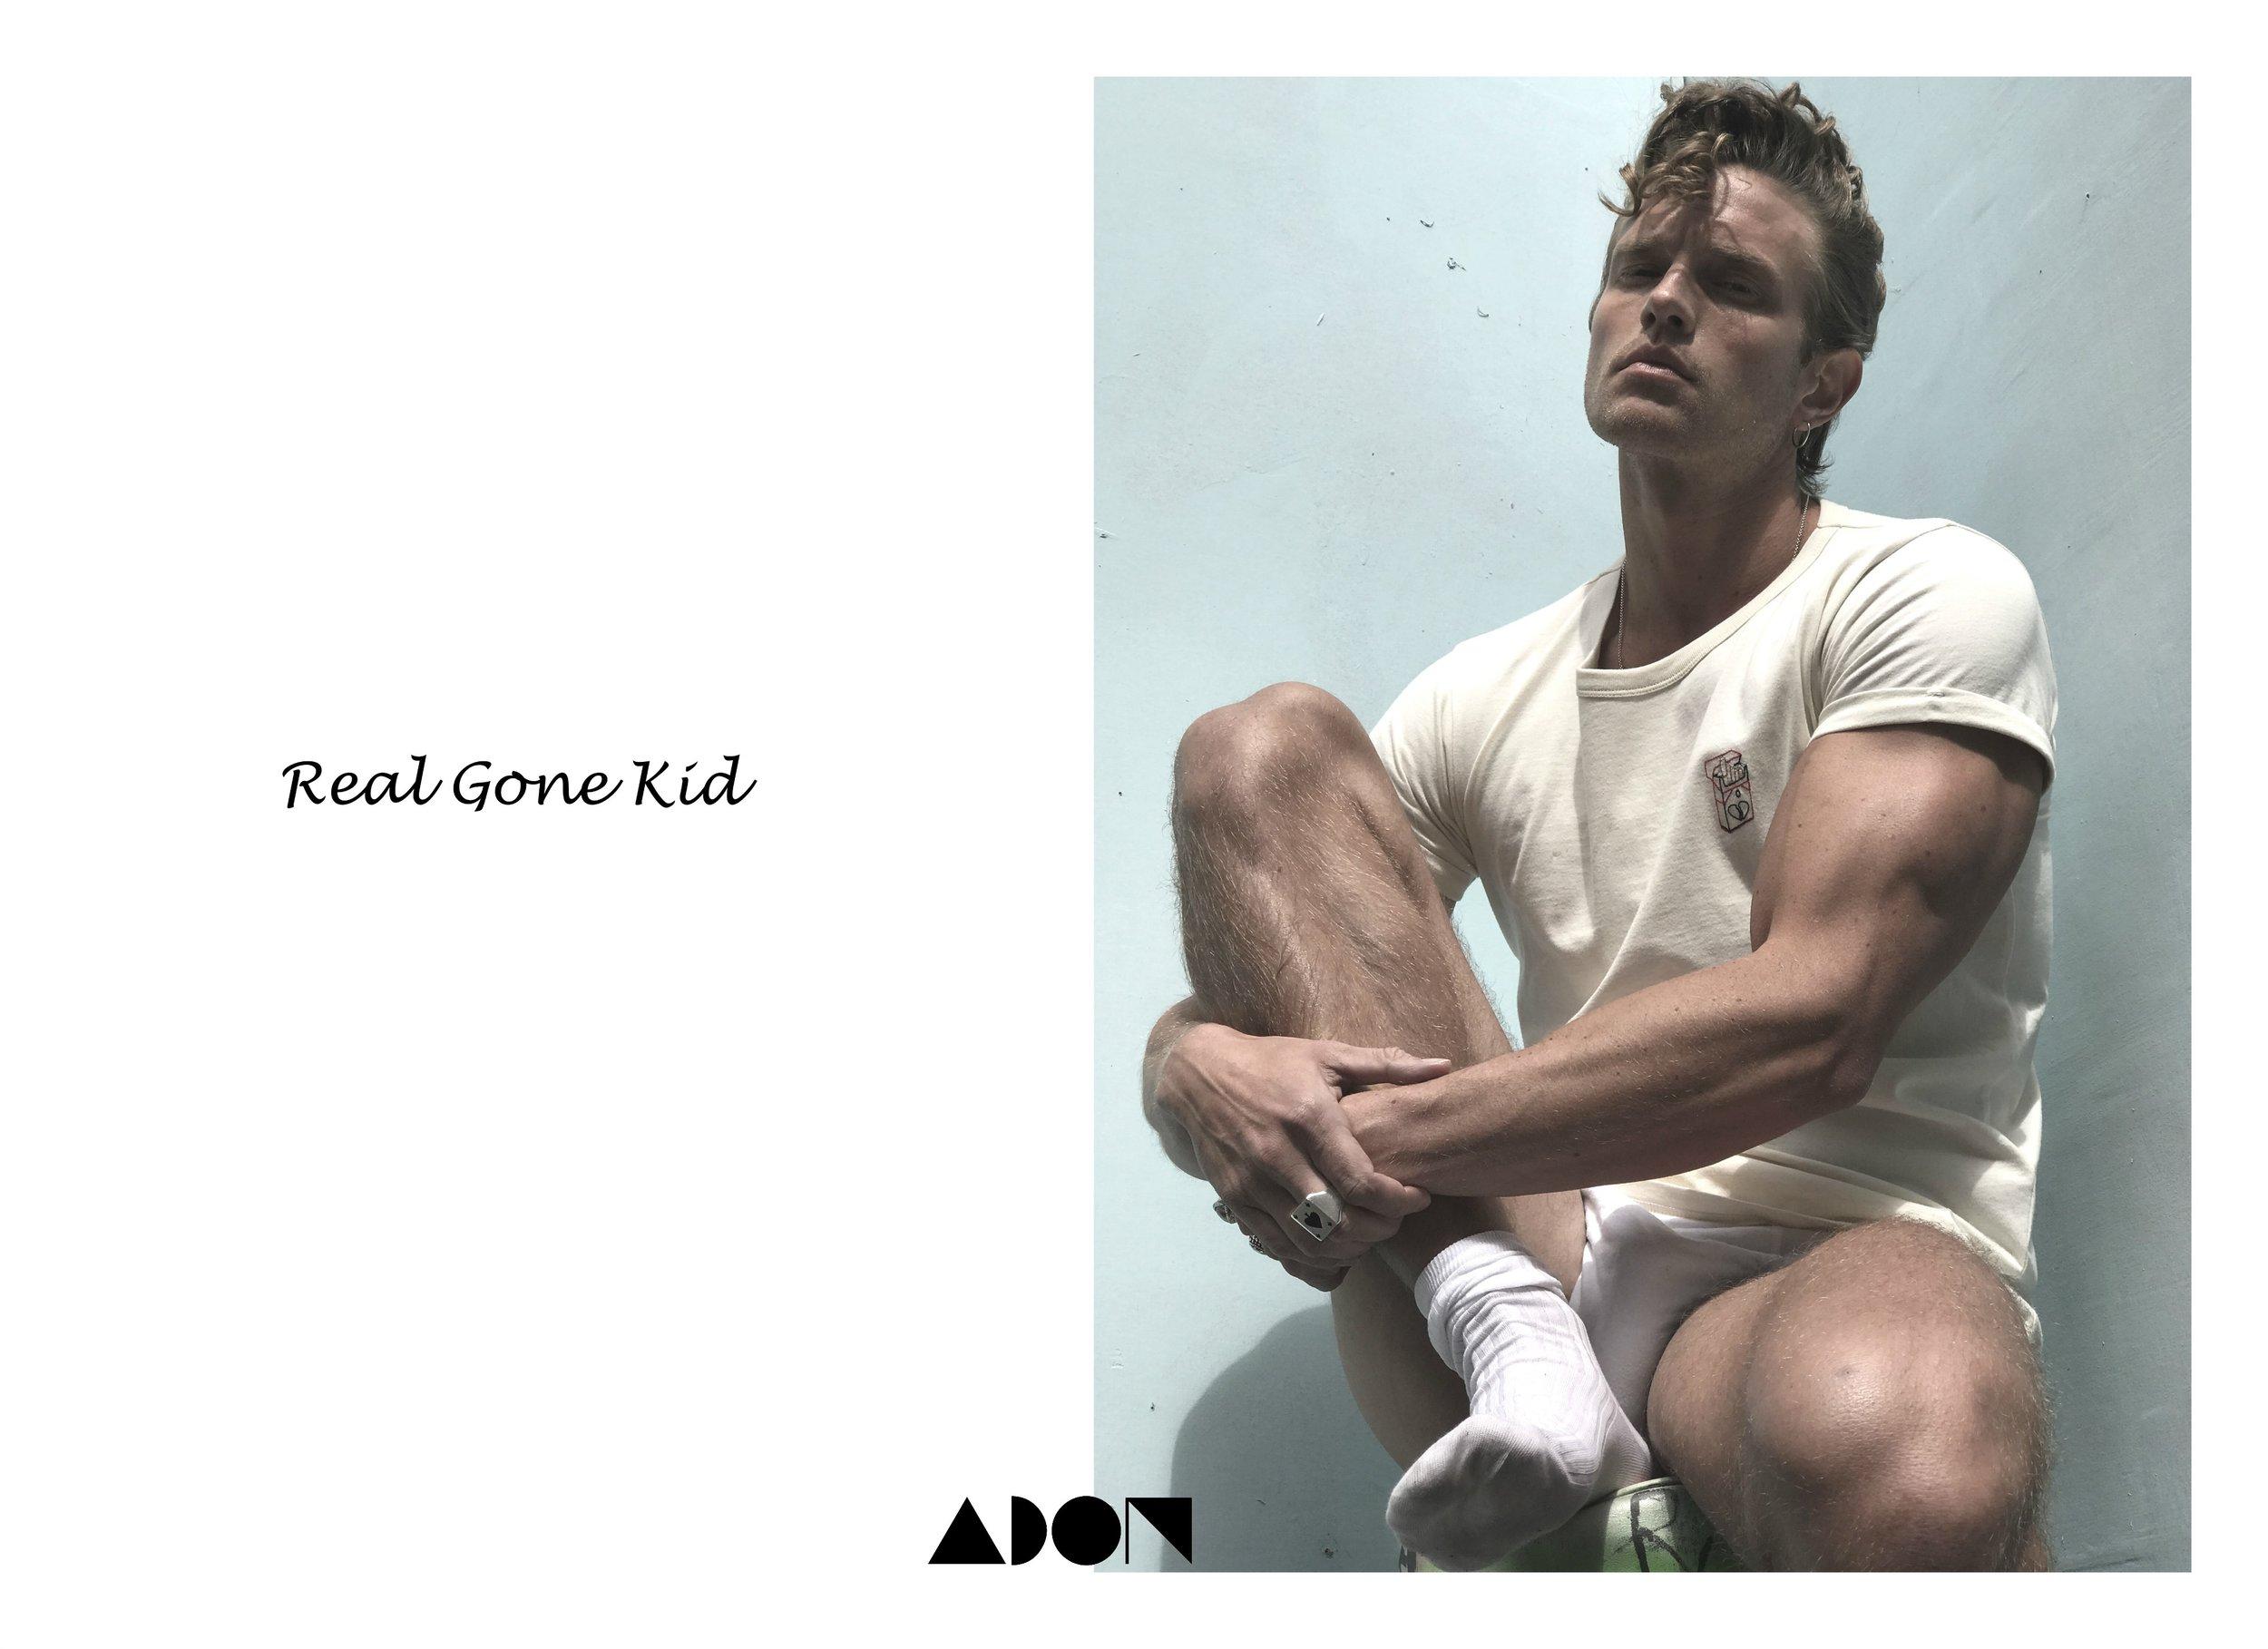 adon magazin- real gone kid july 2018 (5).jpg